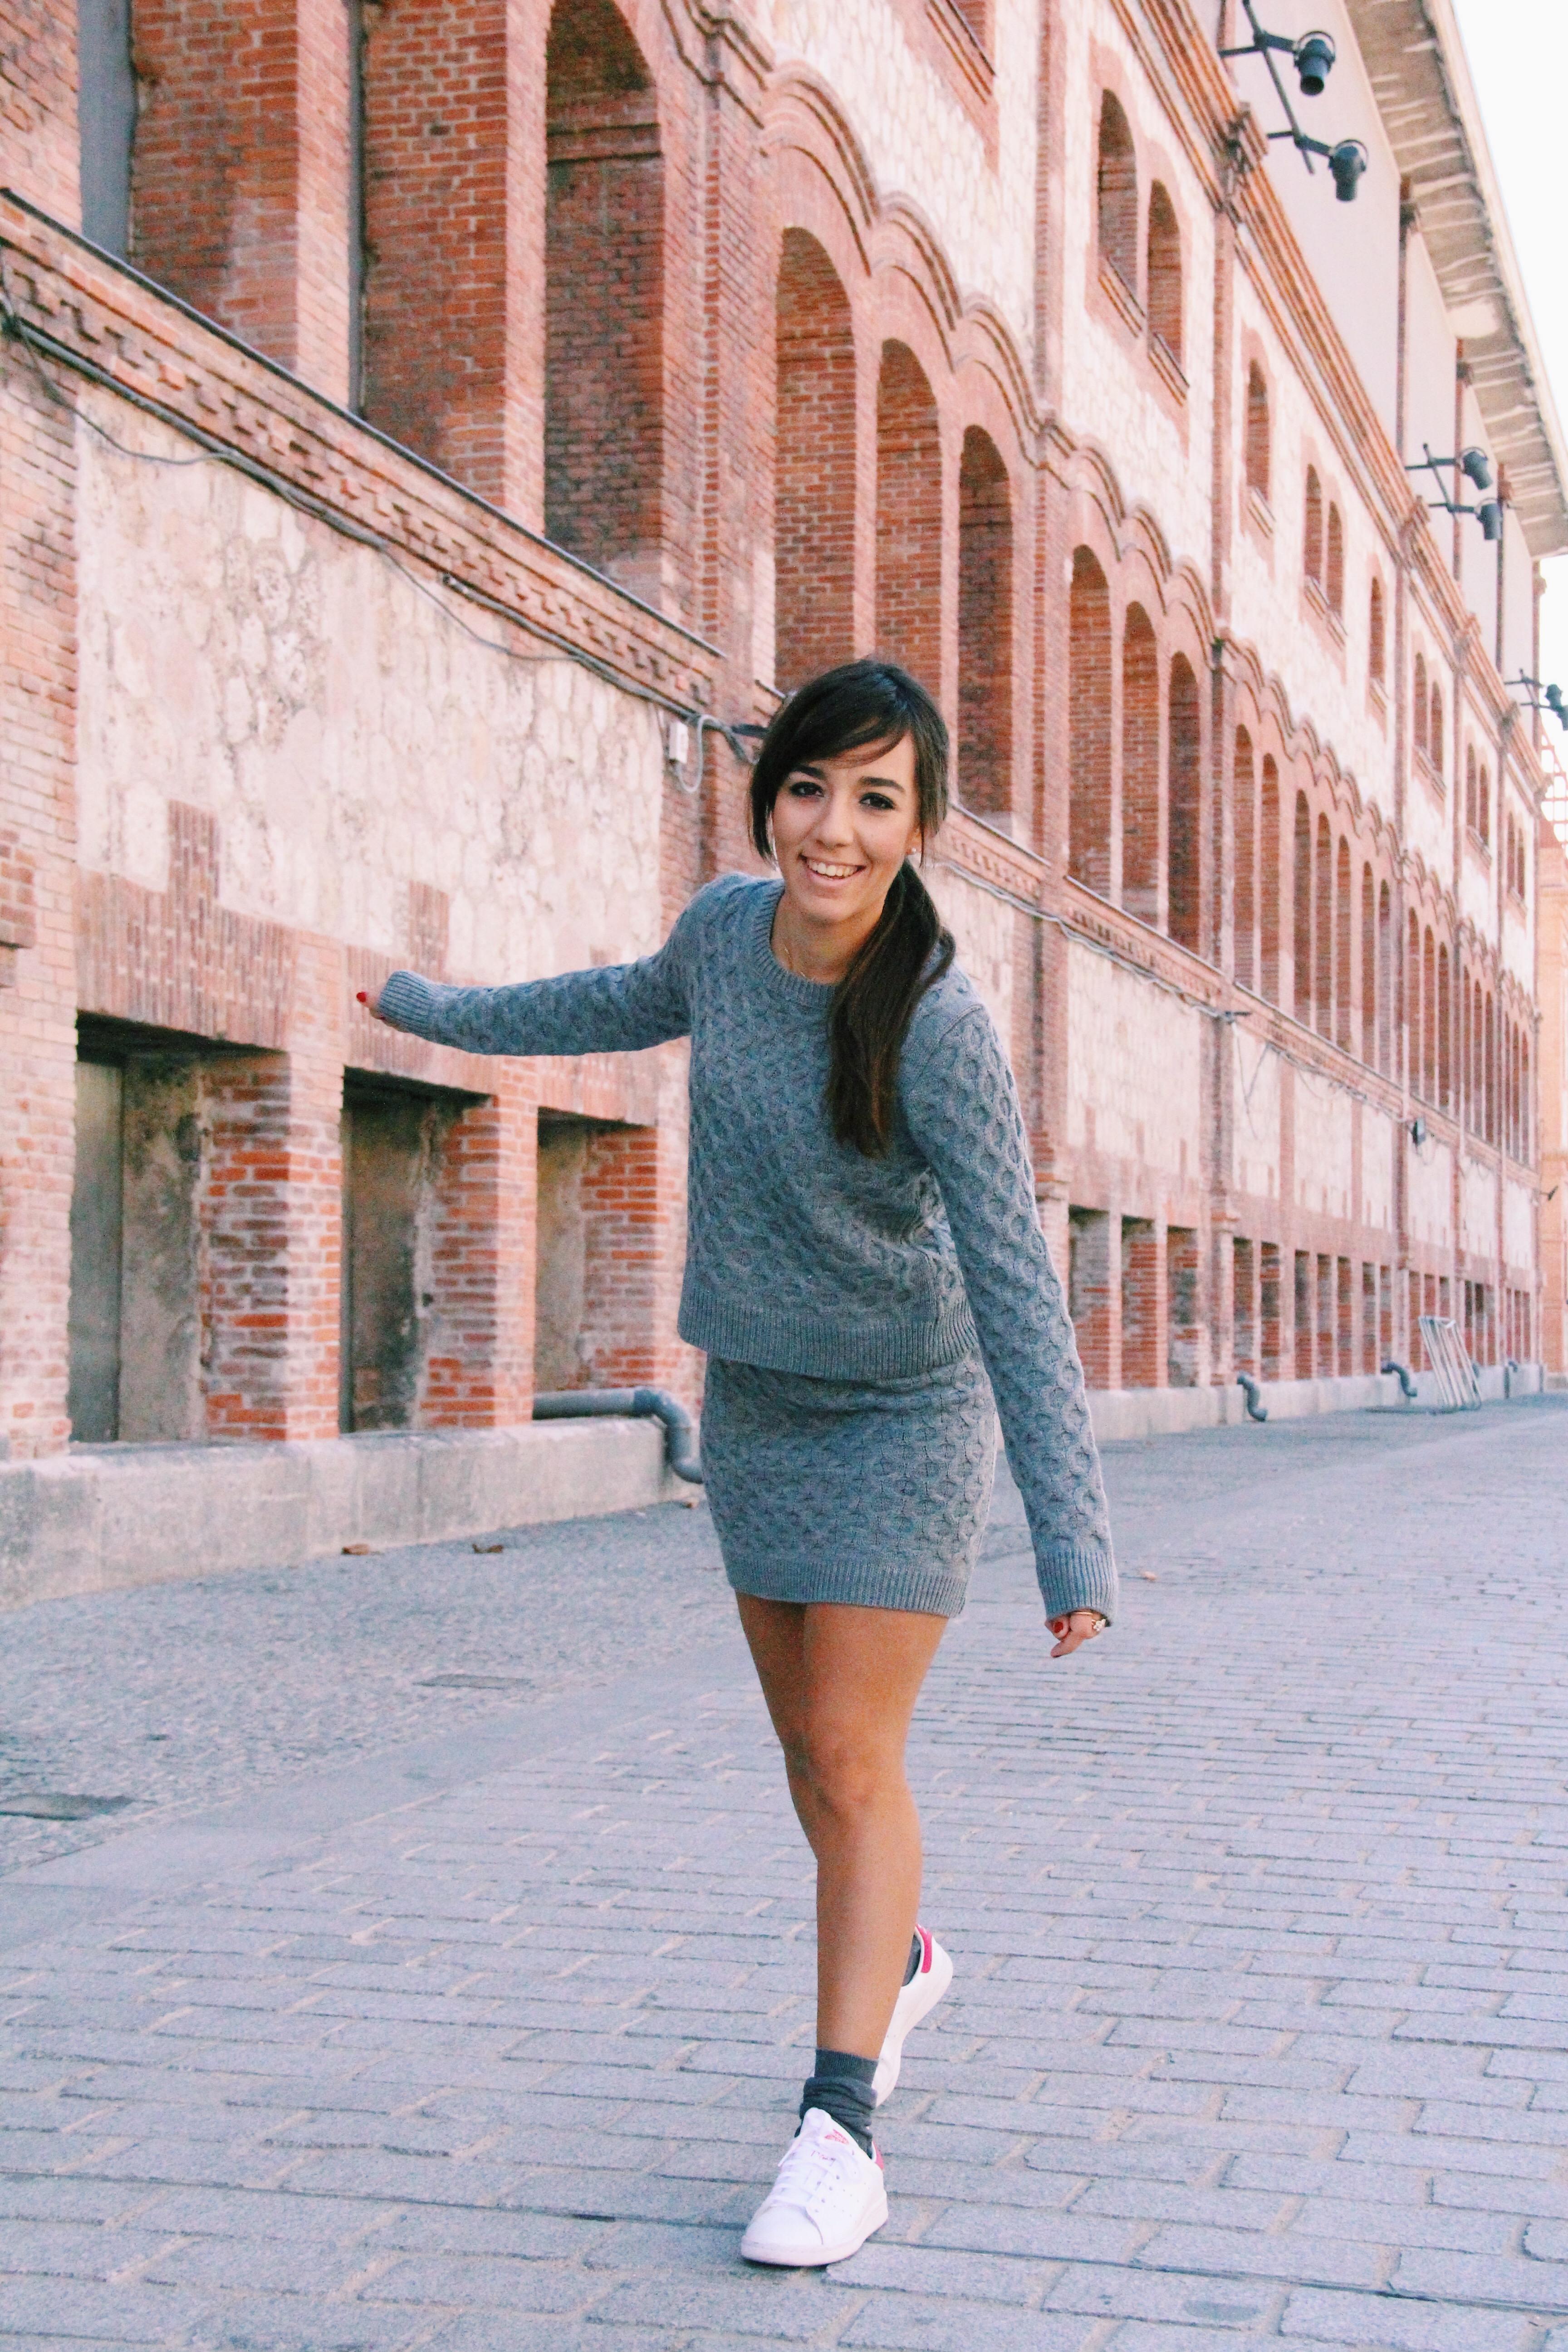 conjunto_de_punto_gris-grey-zapatillas_blancas_how_to_combine_white_sneackers-compañia_fantastica-jersey_de_punto-como_combinar_zapatillas_blancas